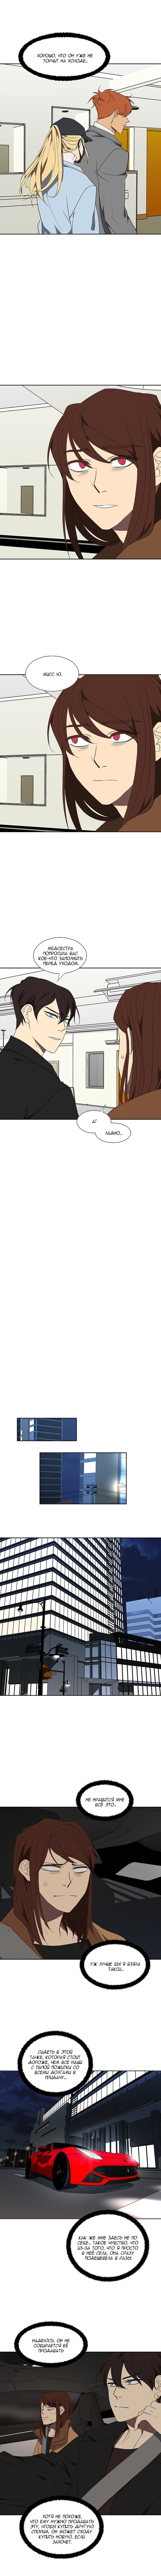 Манга Я люблю Ю / I love Yoo  - Том 1 Глава 67 Страница 5